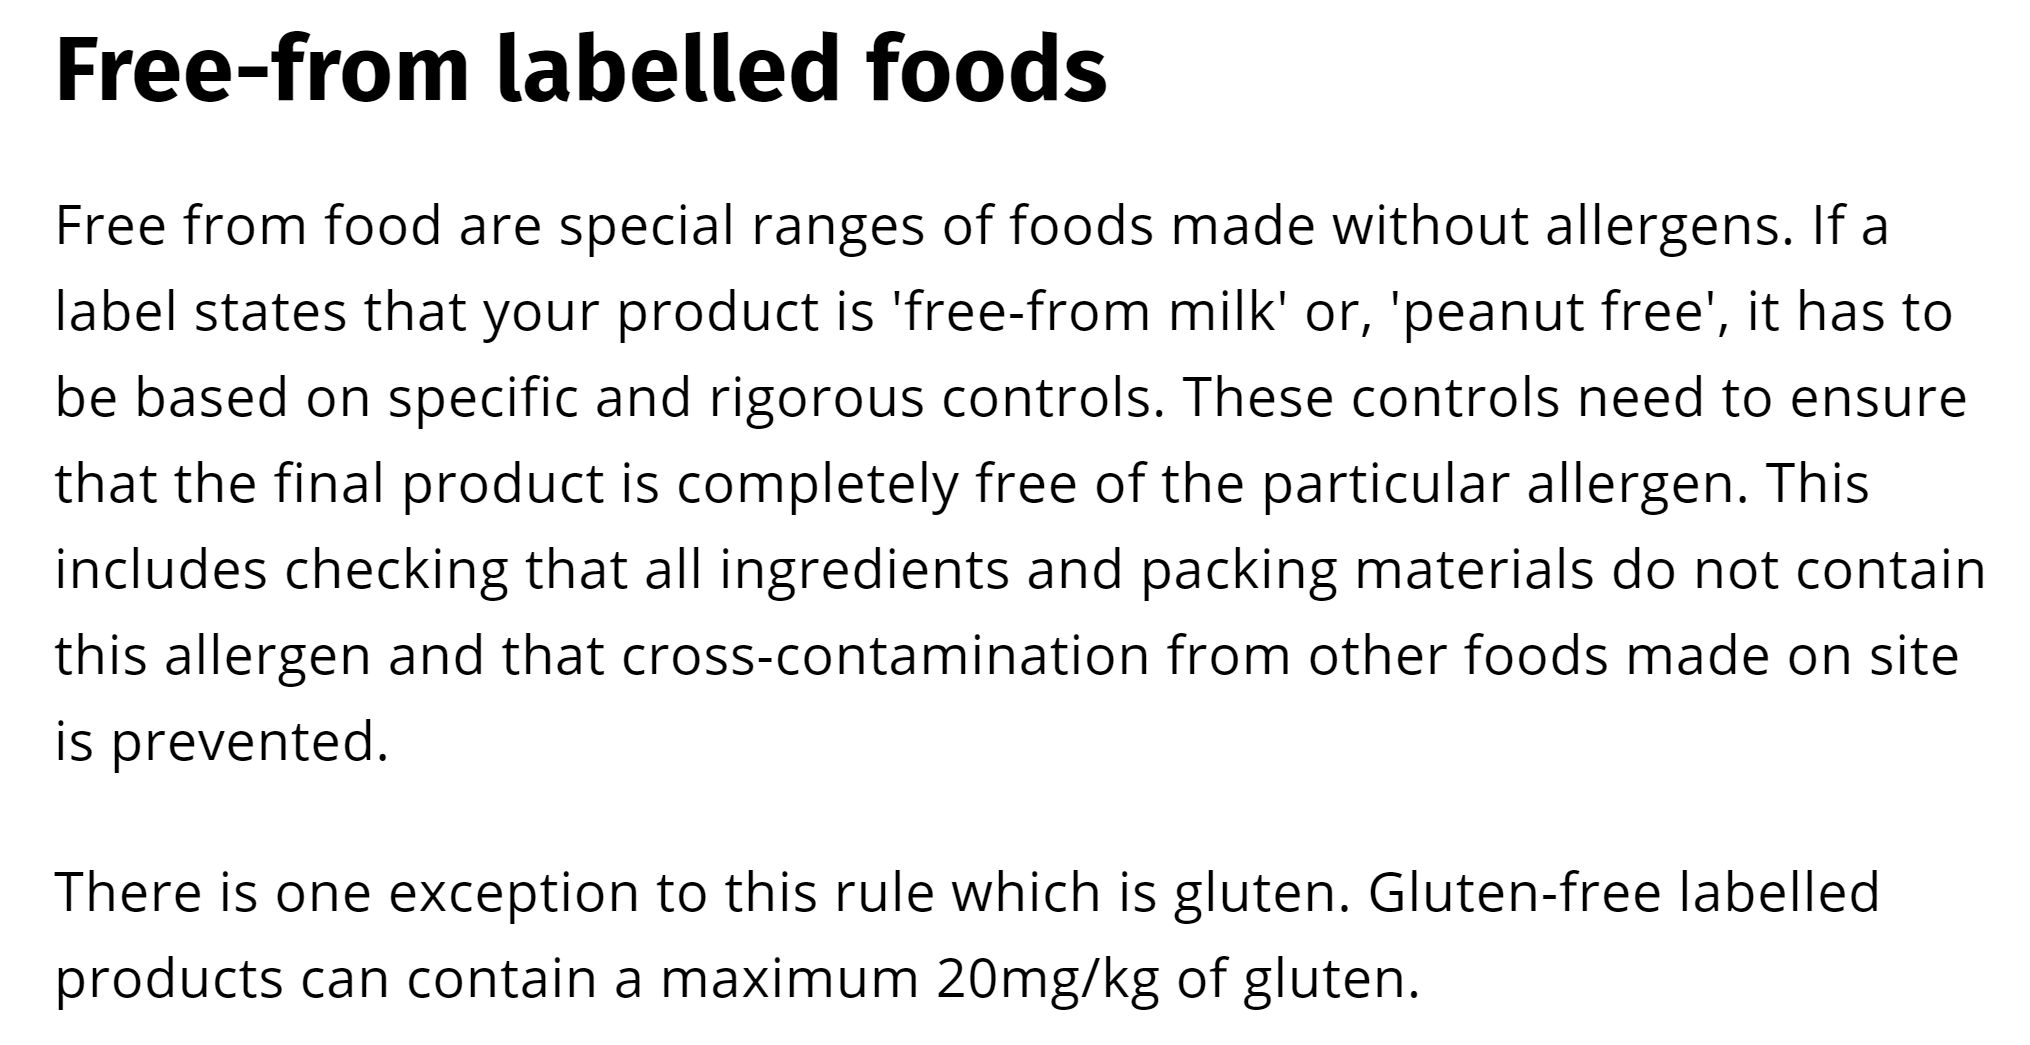 Source - Food Standards Agency